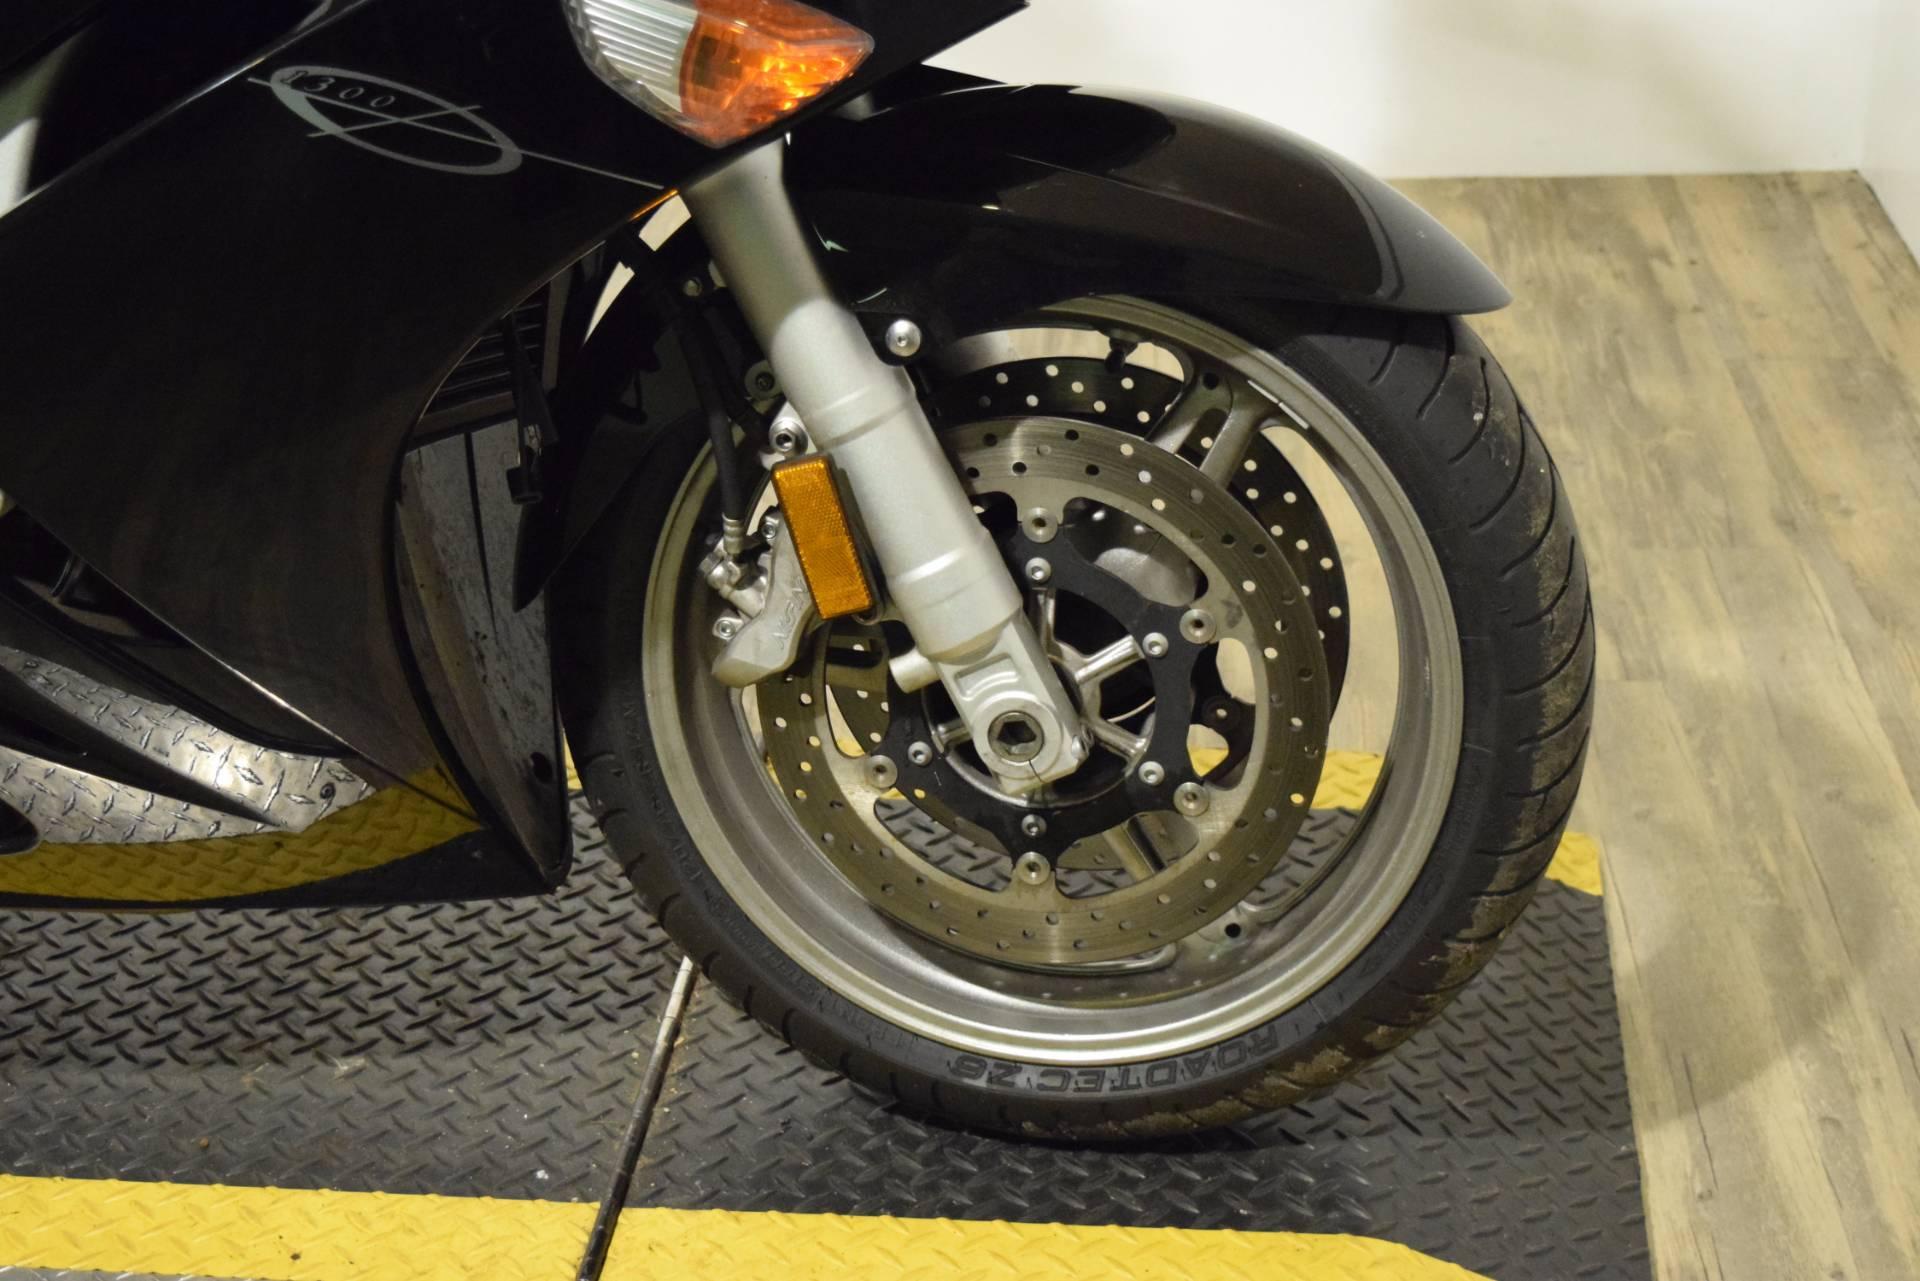 2008 Yamaha FJR 1300A 2